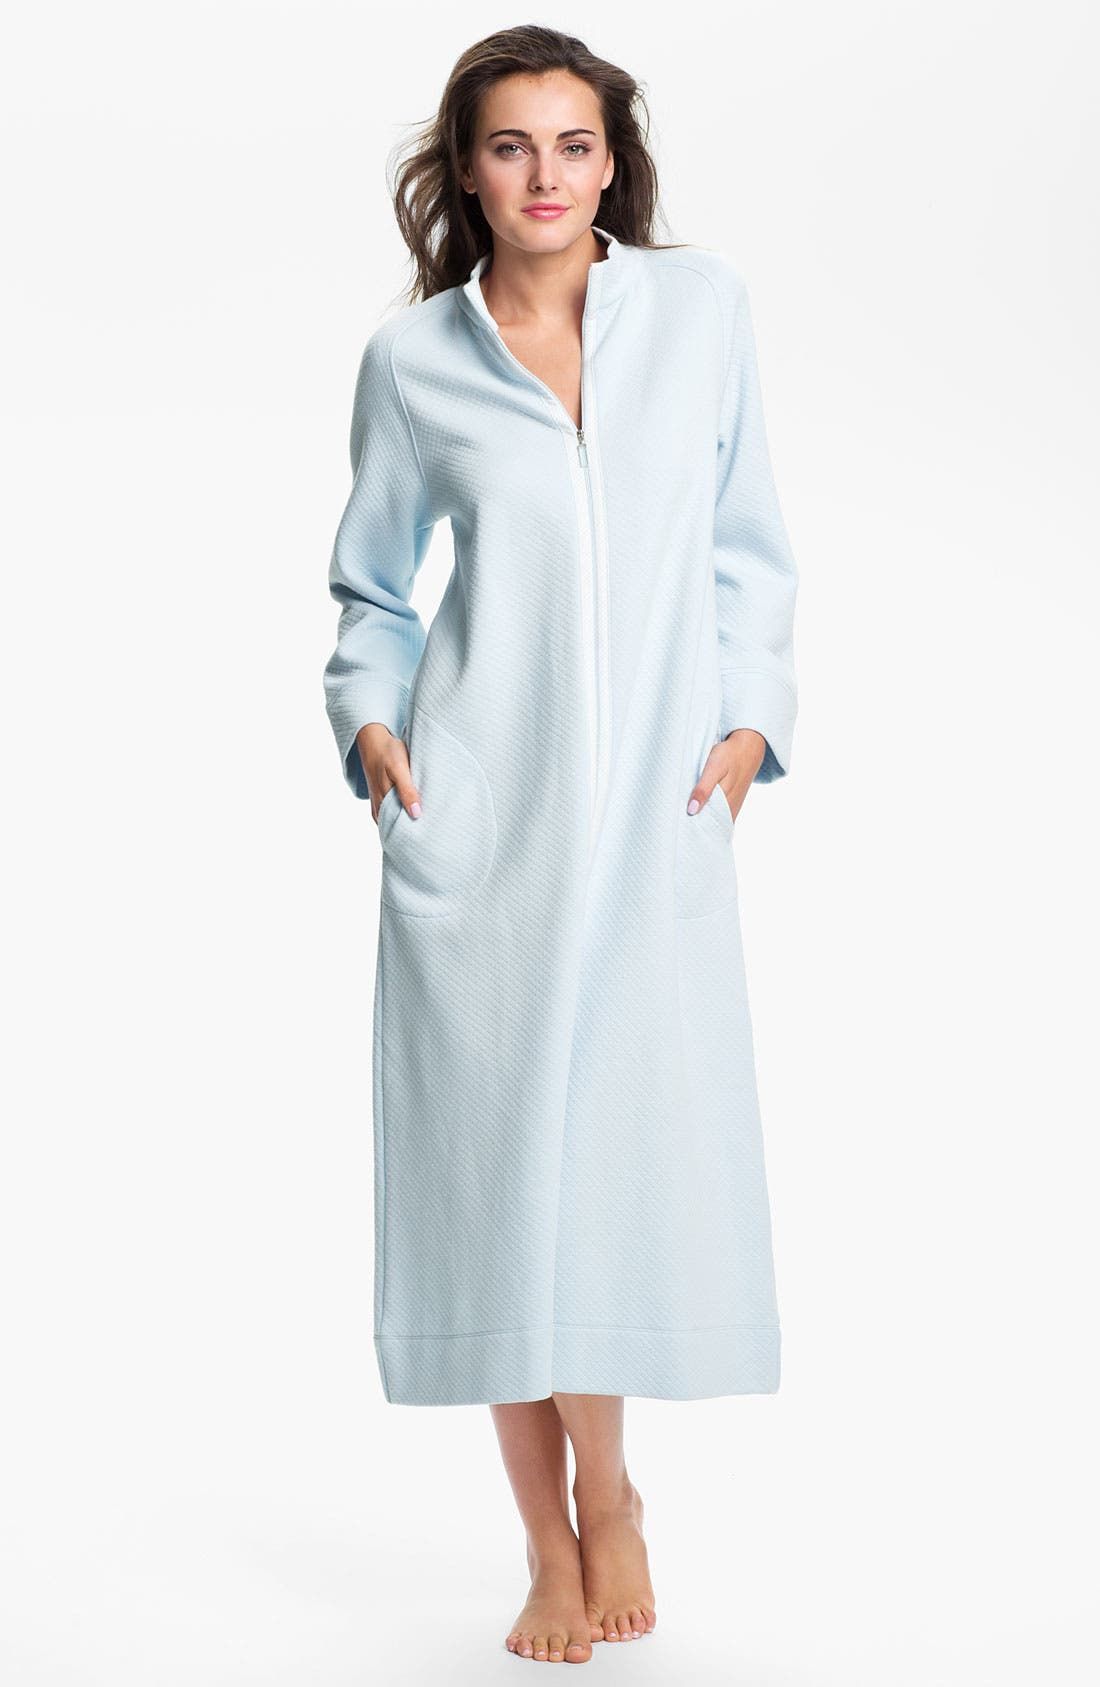 Alternate Image 1 Selected - Carole Hochman Designs Diamond Quilt Zip Front Robe